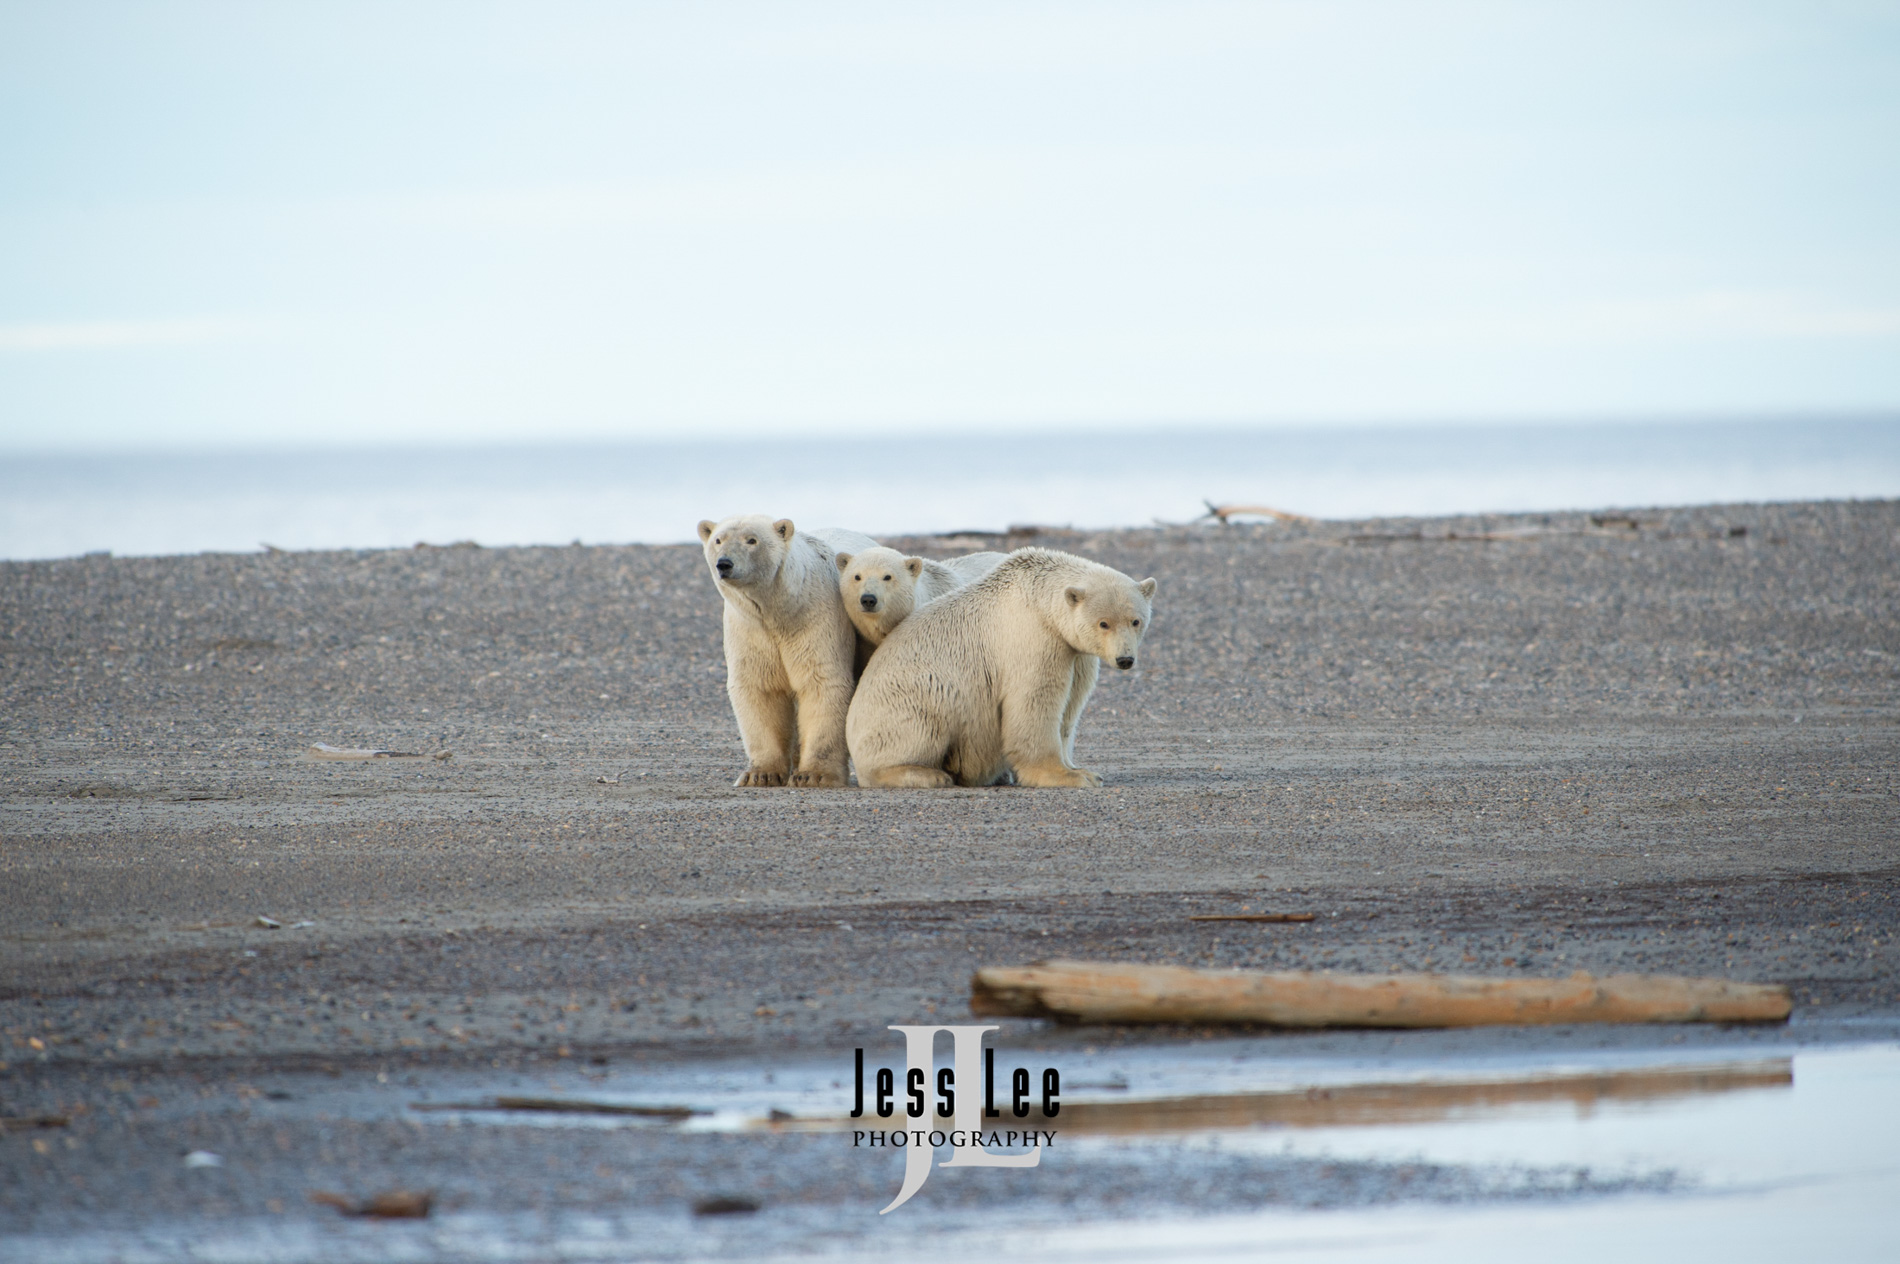 Alaska Polar Bear,arctic, arctic National wildlife refuge, bear, bears, , photo